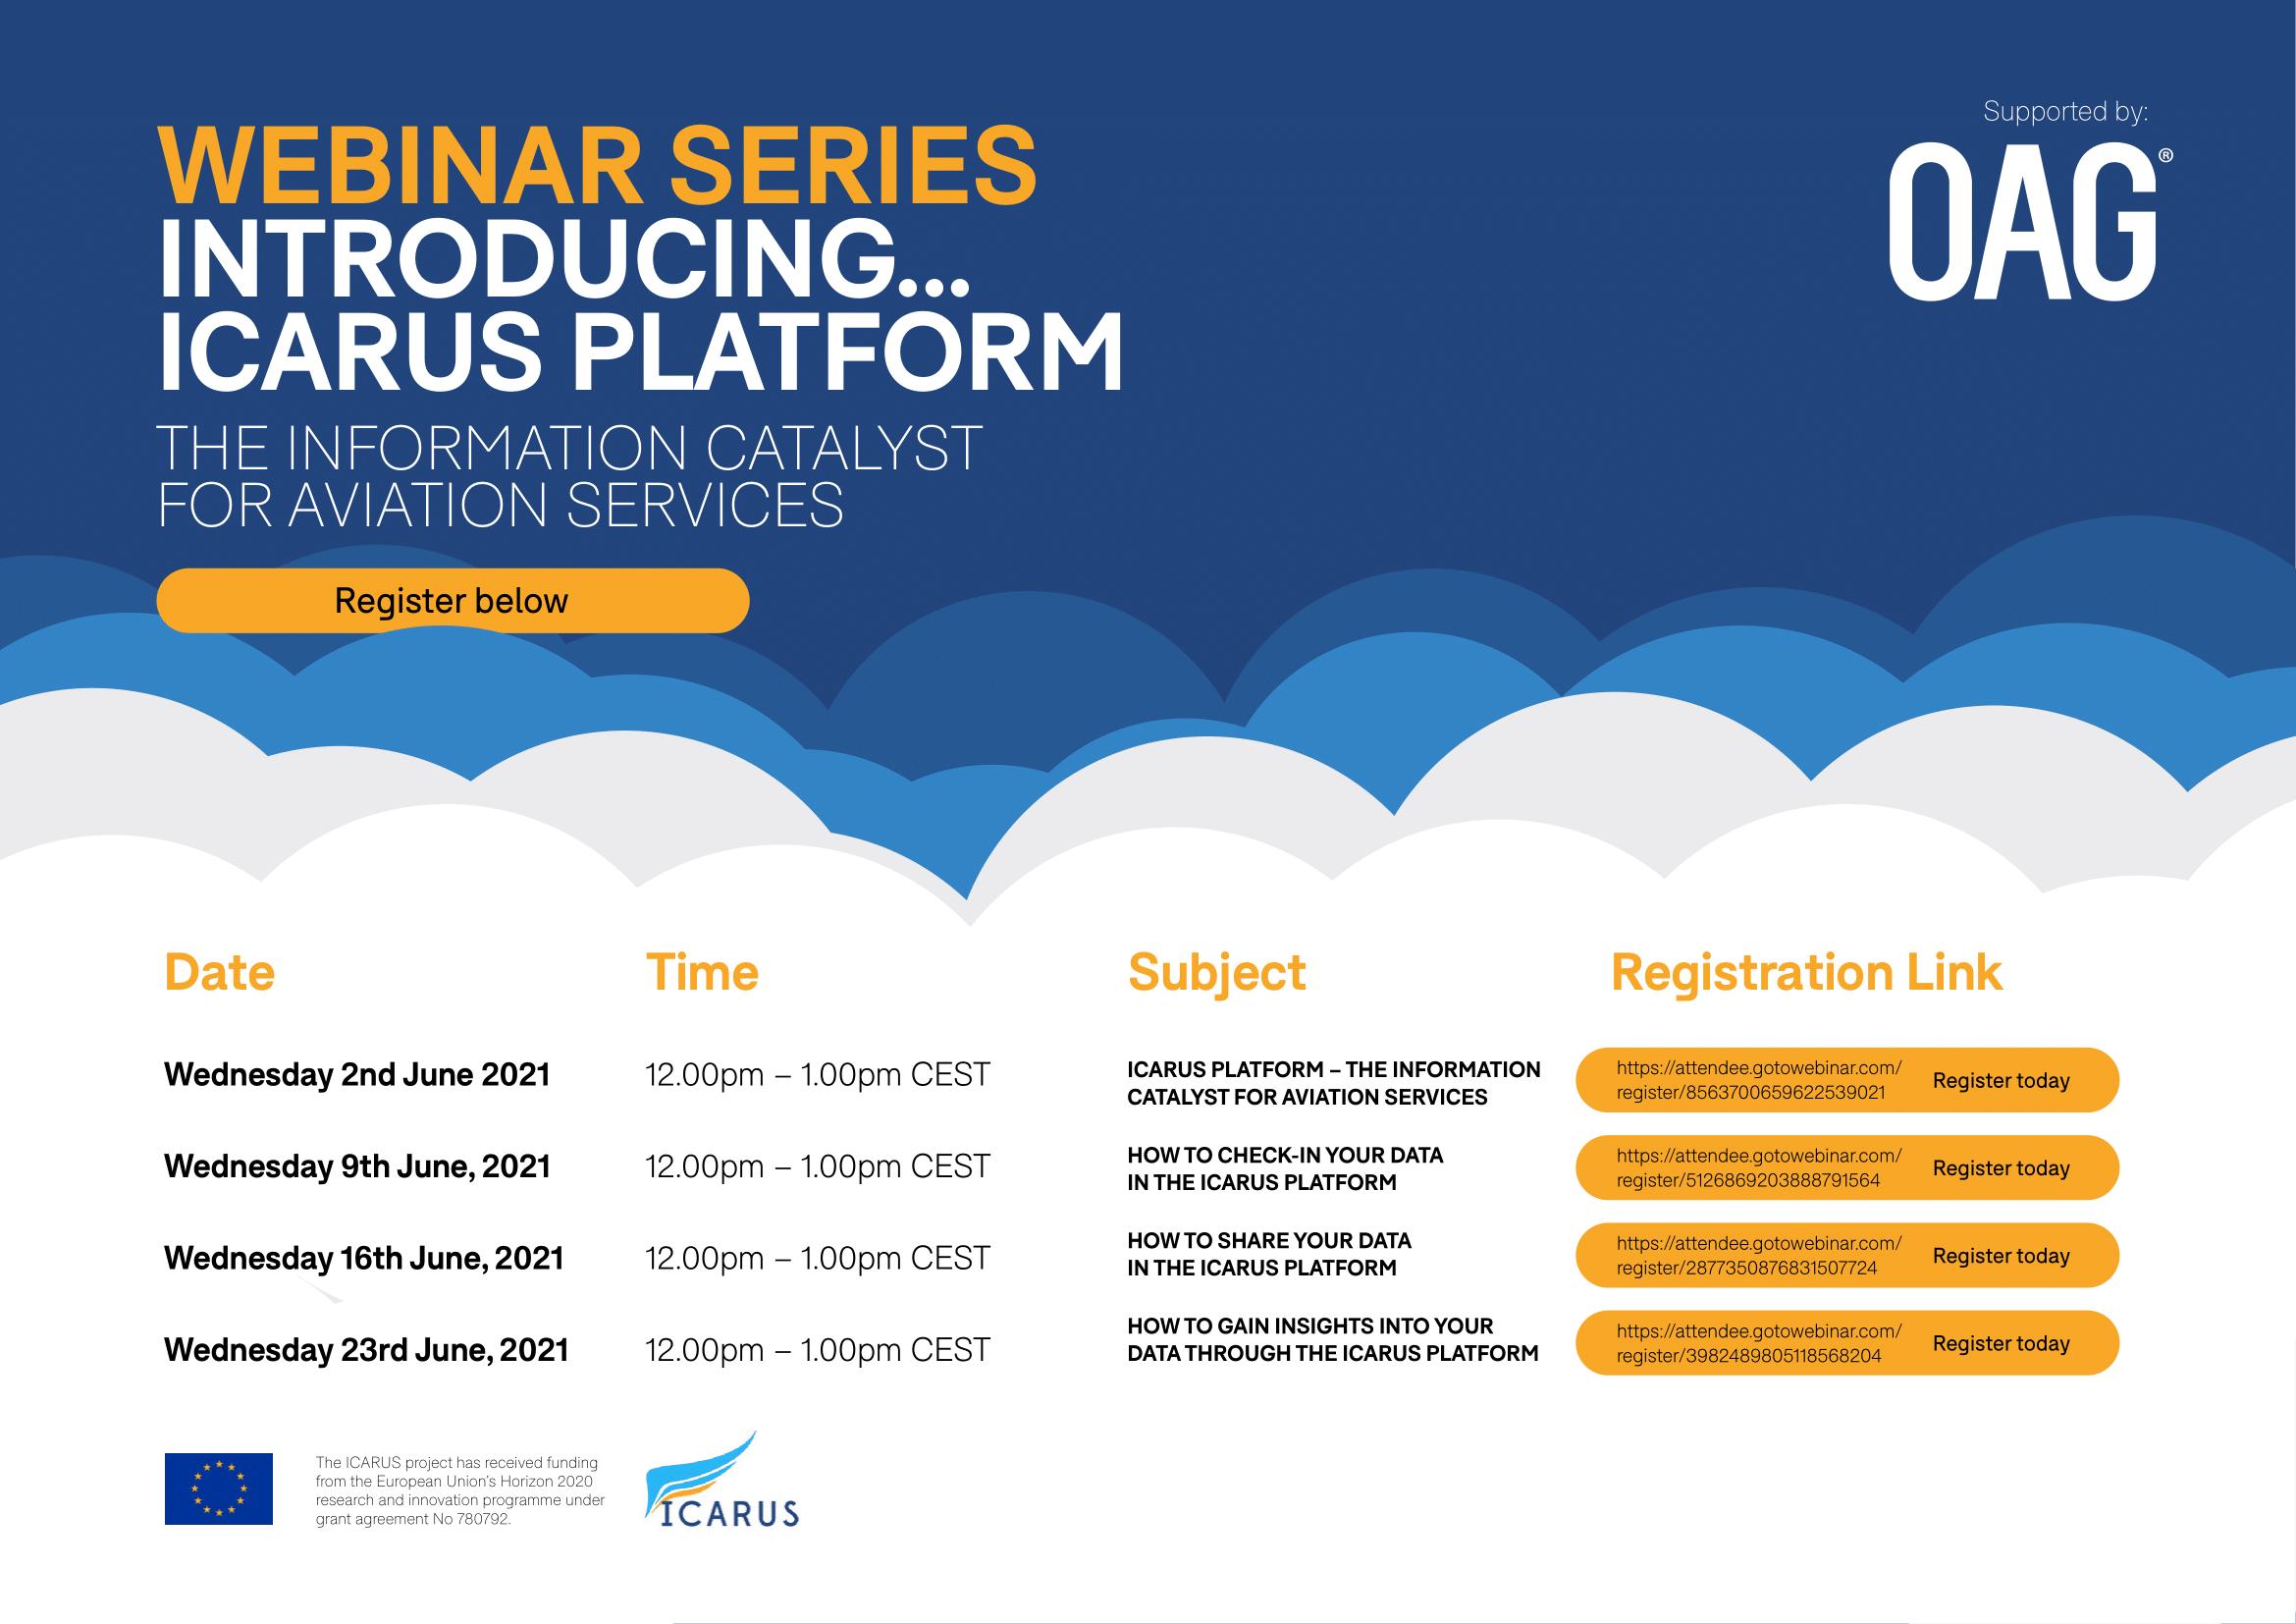 introducing...icarus platform webinar series